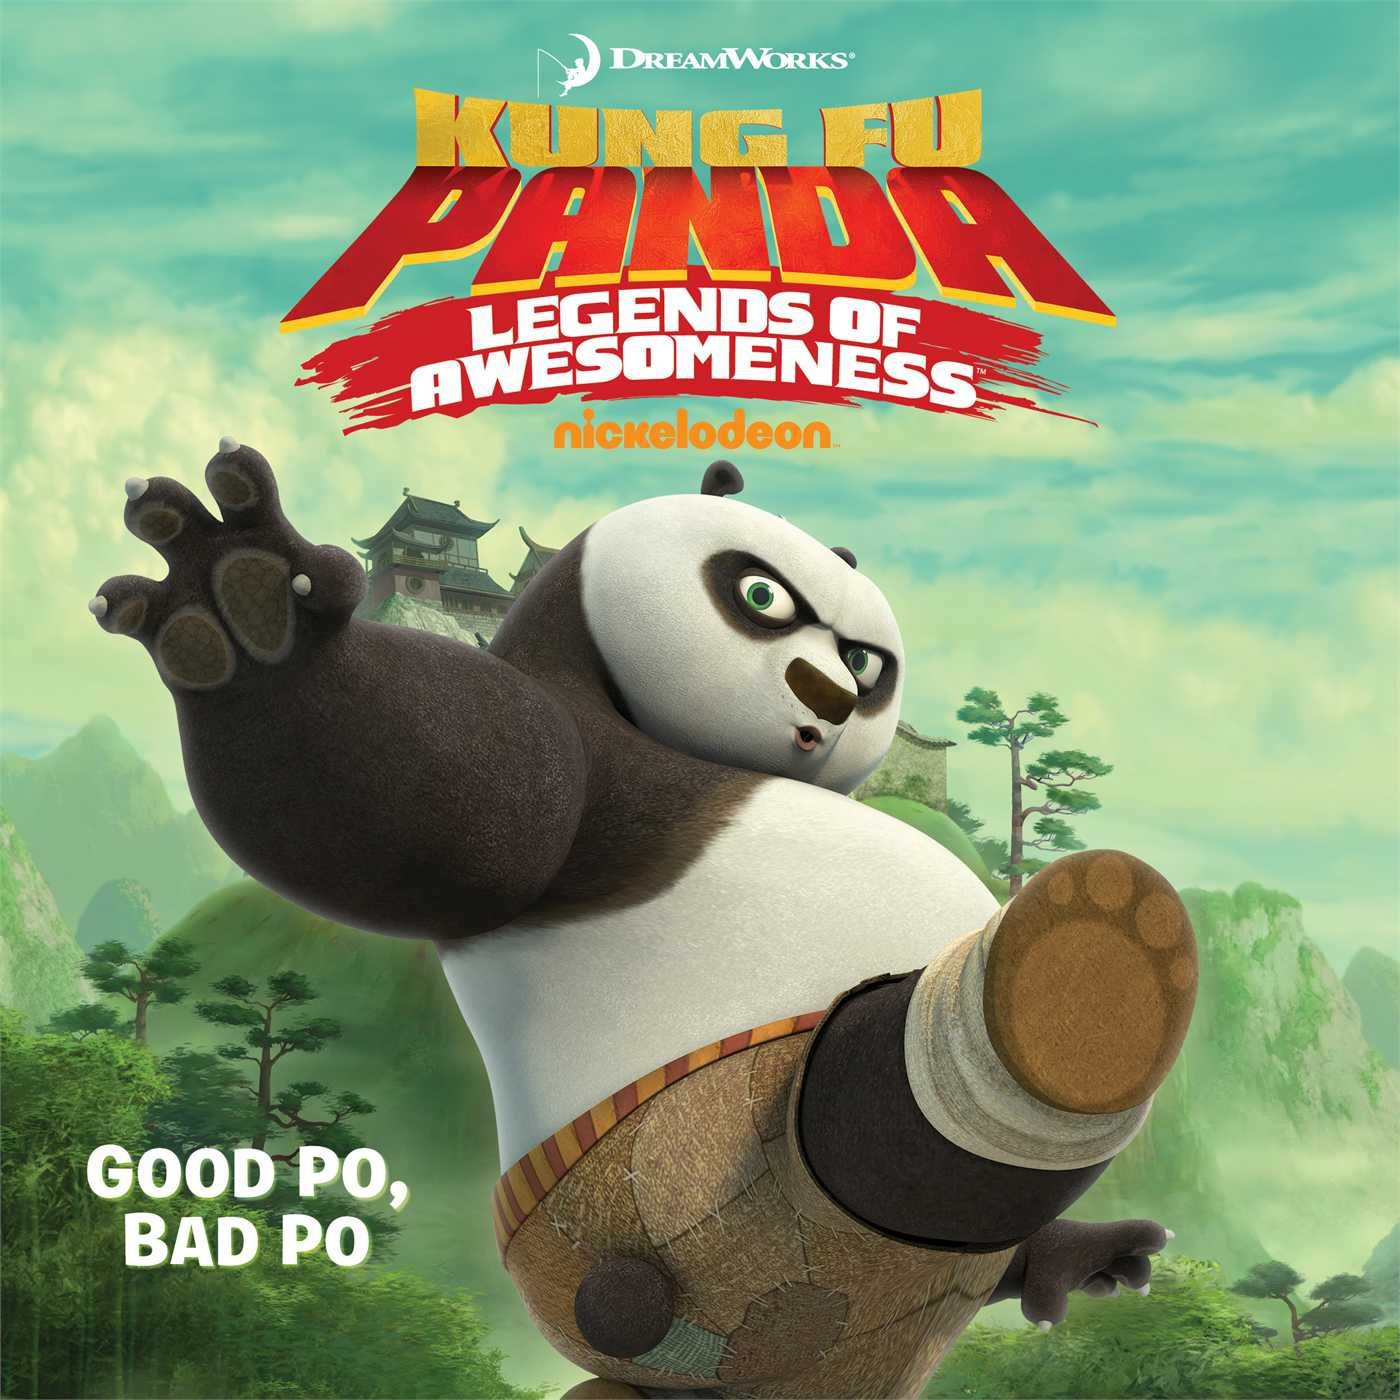 Good Po, Bad Po (Kung Fu Panda TV). Book.